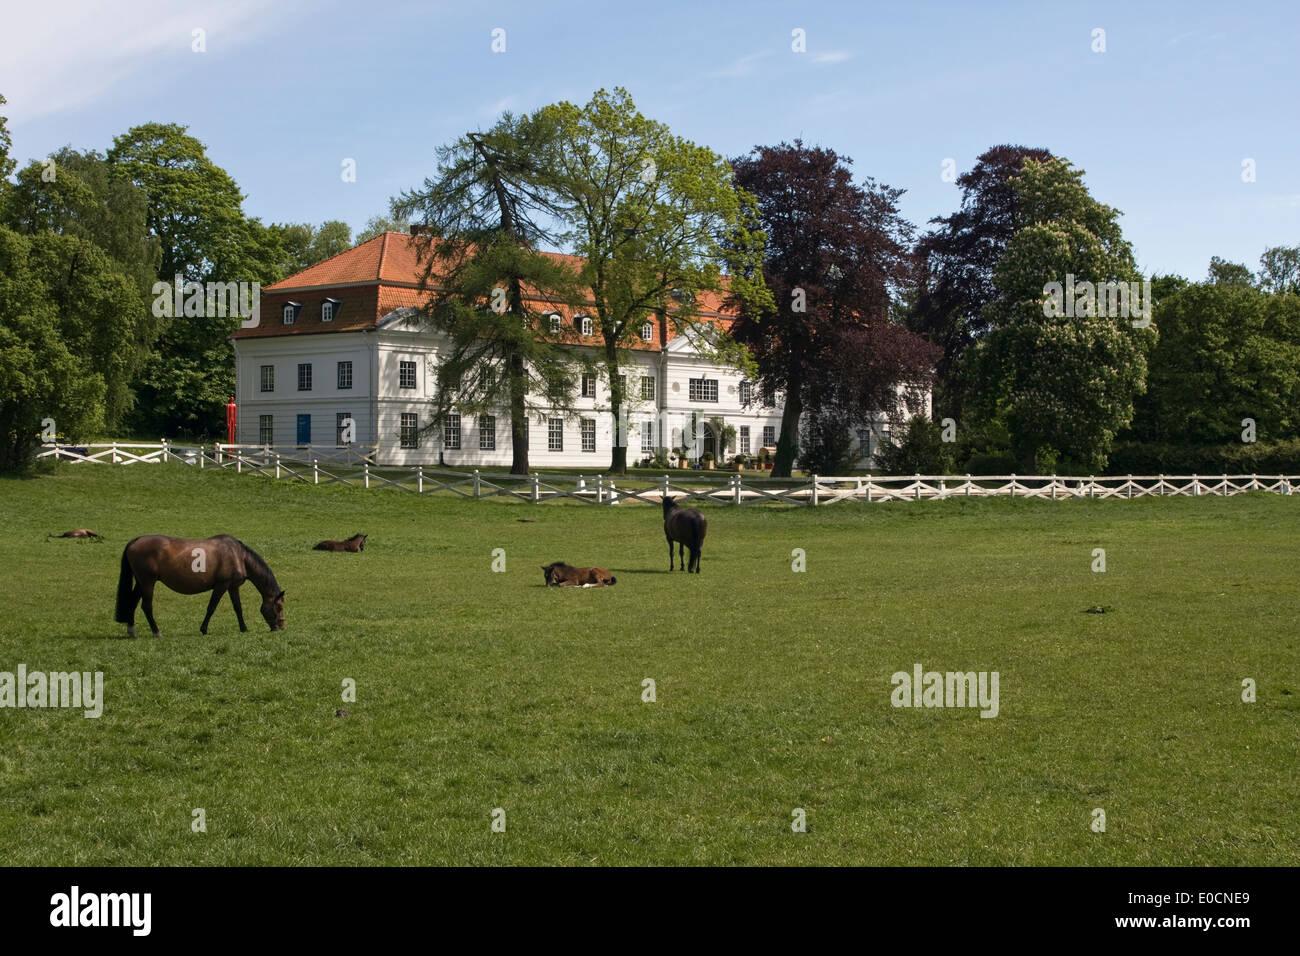 Europa, Deutschland, Schleswig Holstein, Panker, Gut Panker - Stock Image